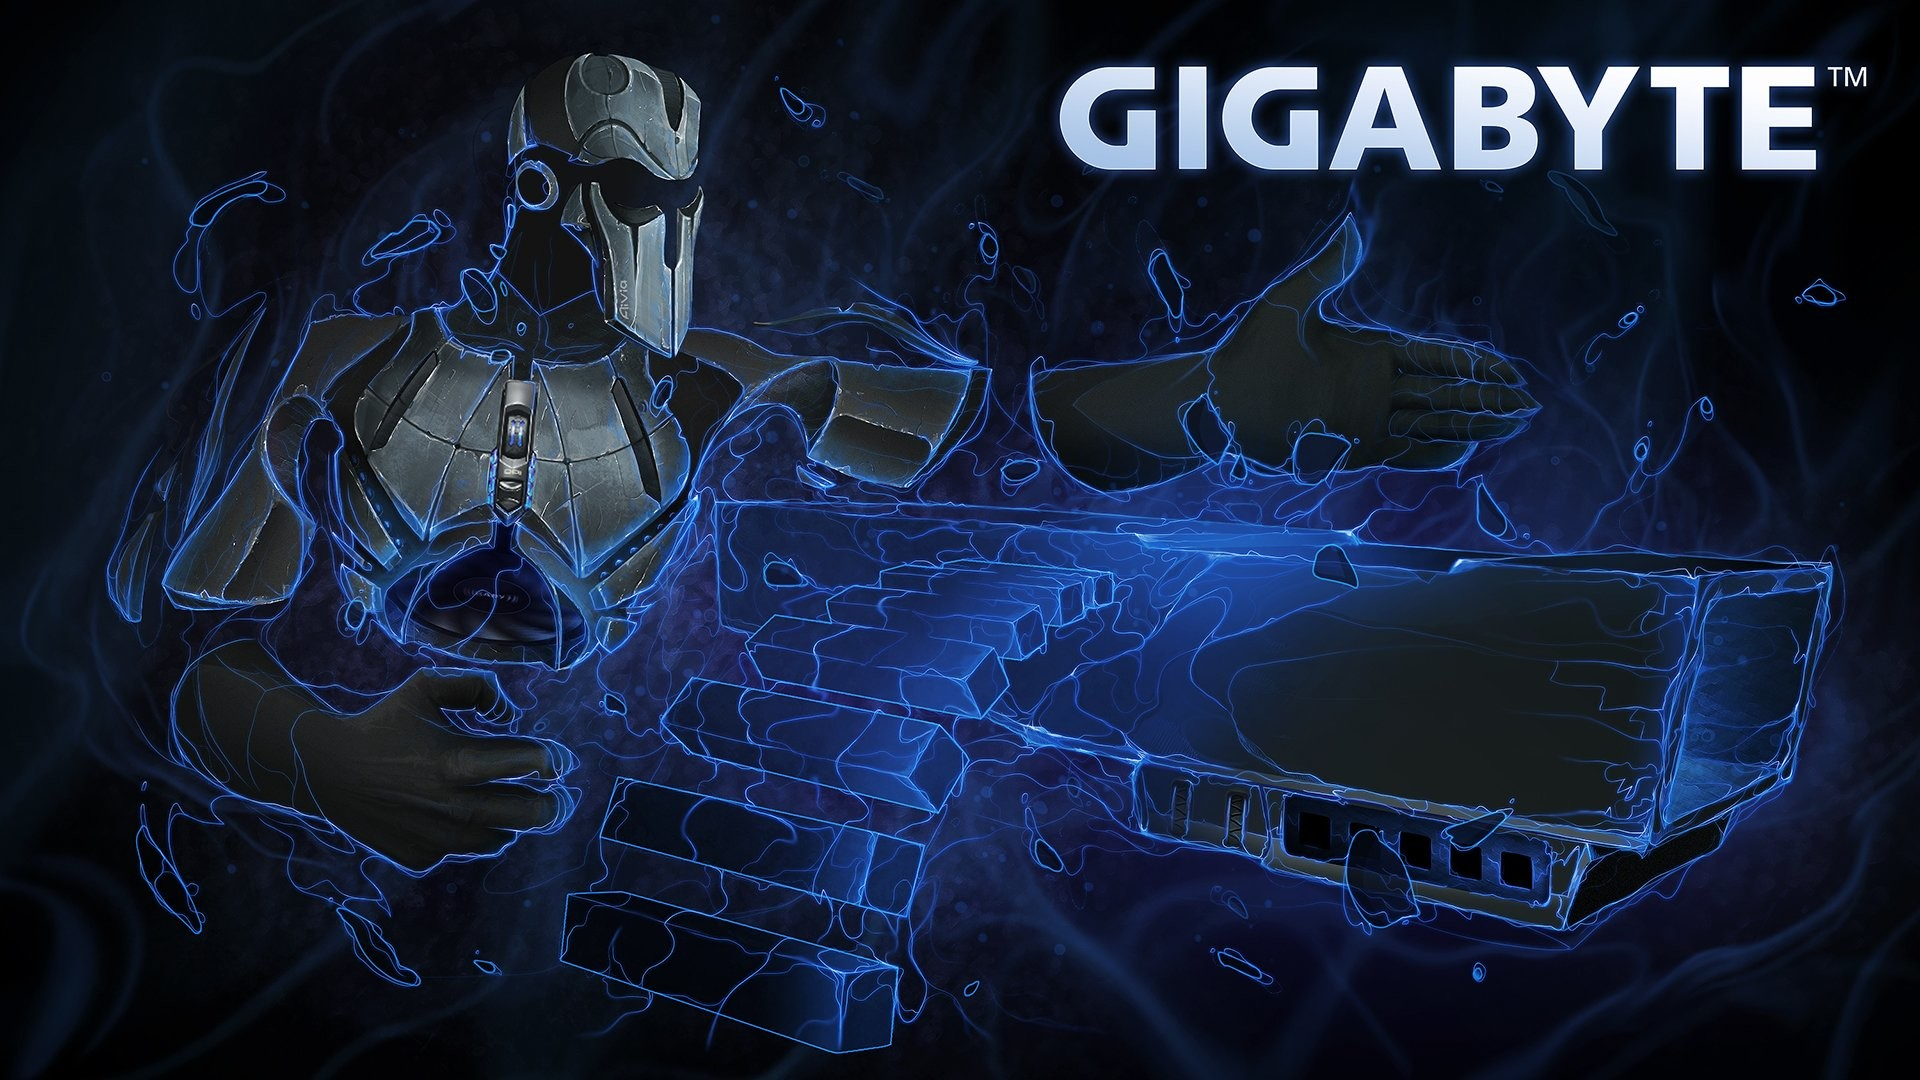 Gigabyte Gaming Wallpapers 1920×1080